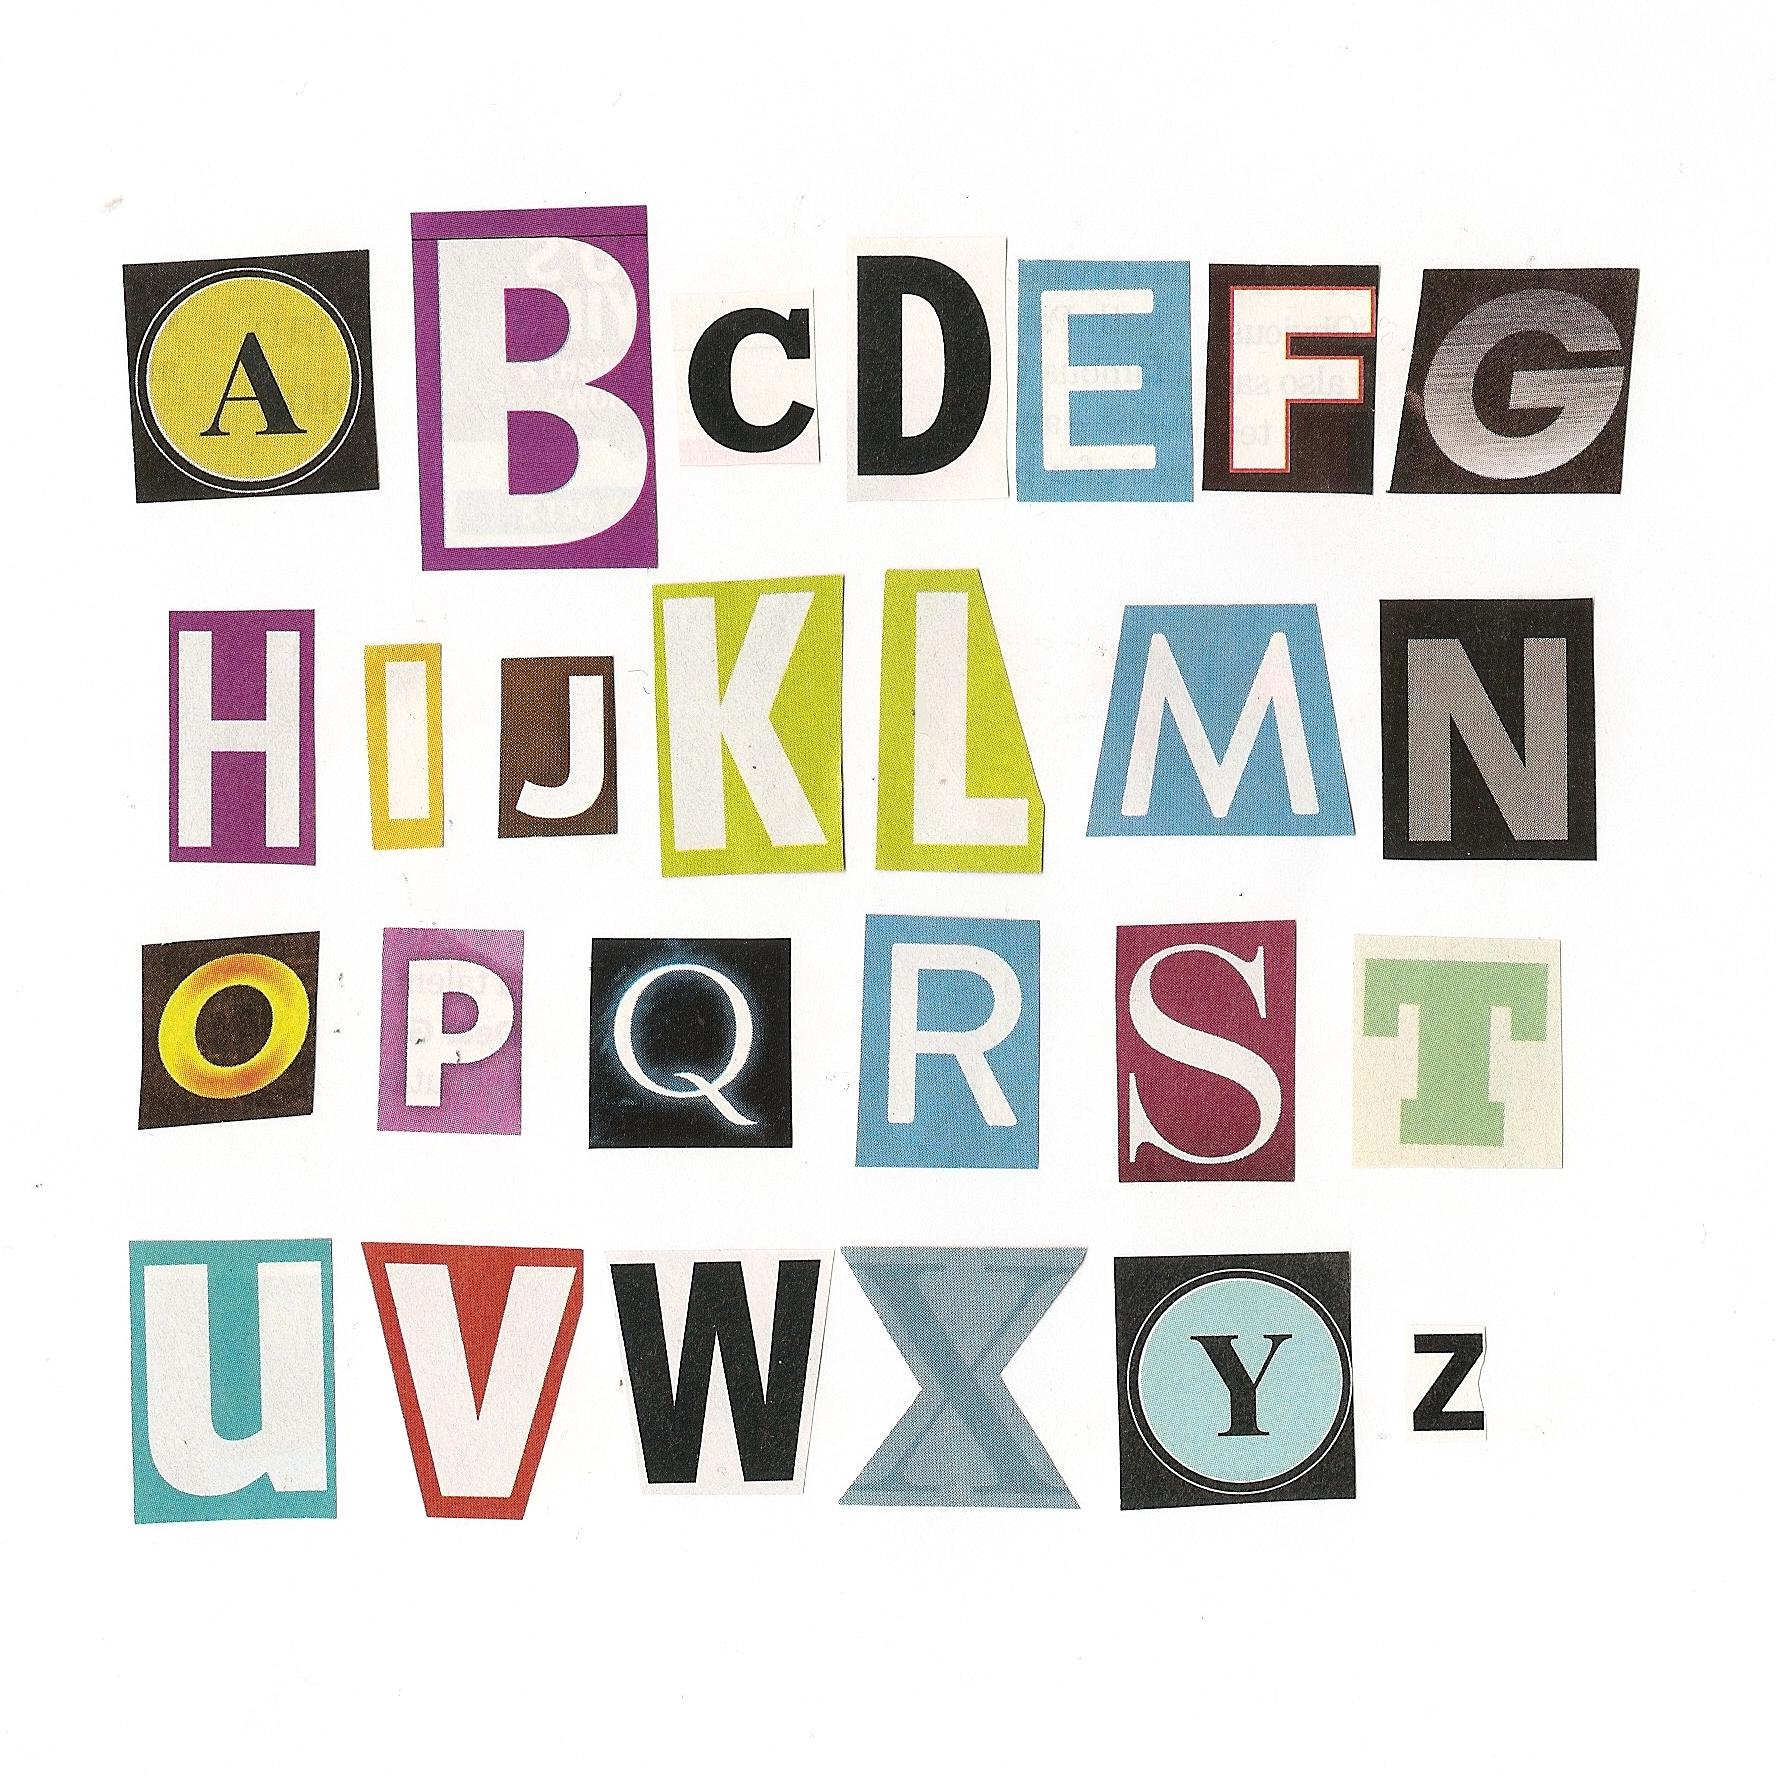 Magazine Letters Cut Out Quotes QuotesGram